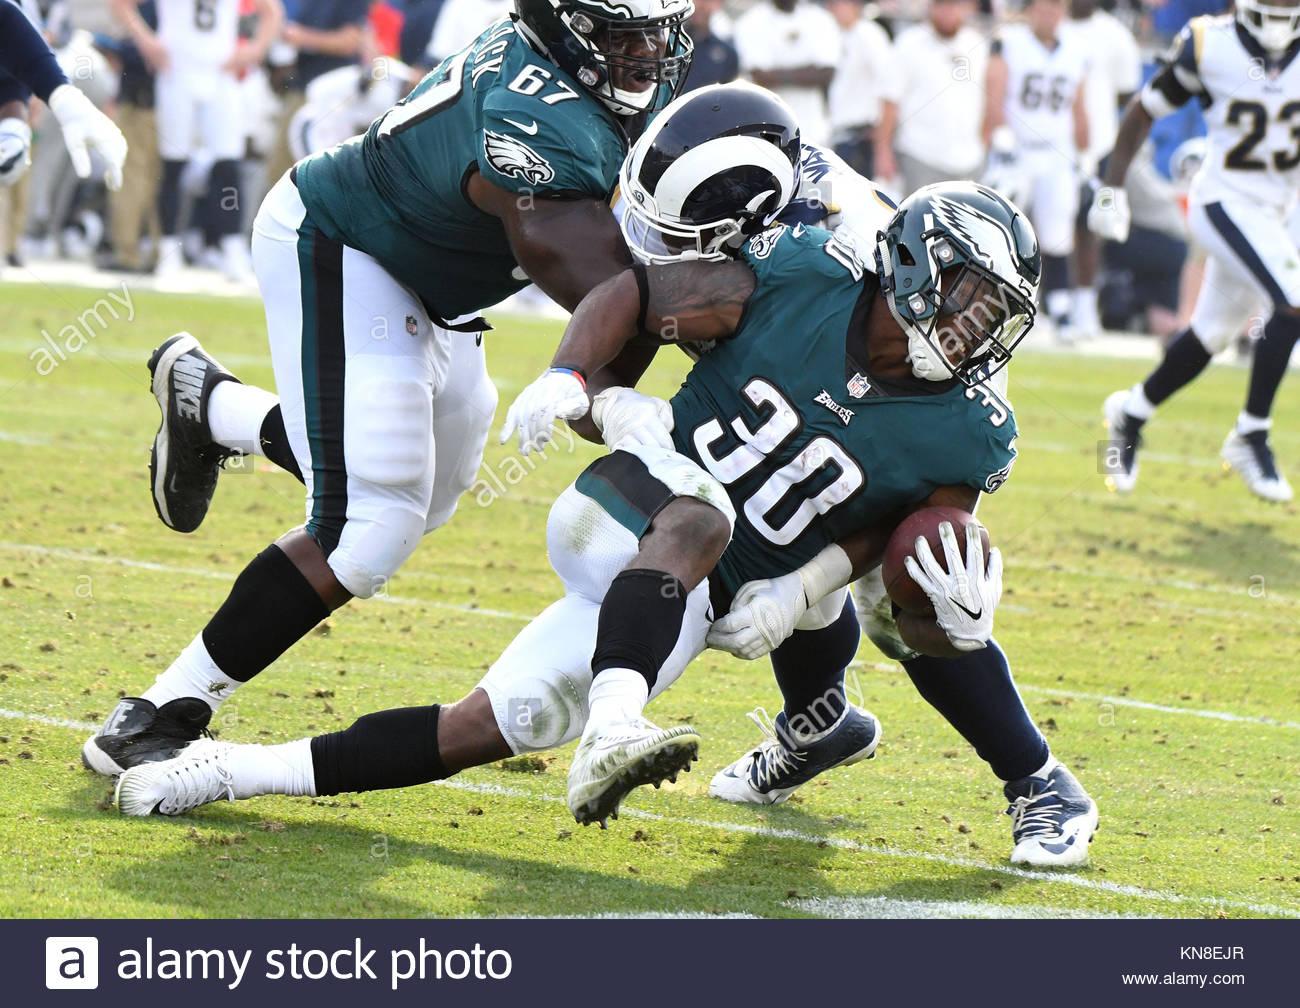 Los Angeles, California, USA. 11th Dec, 2017. Philadelphia Eagles running back Corey Clement (30) runs for yardage - Stock Image